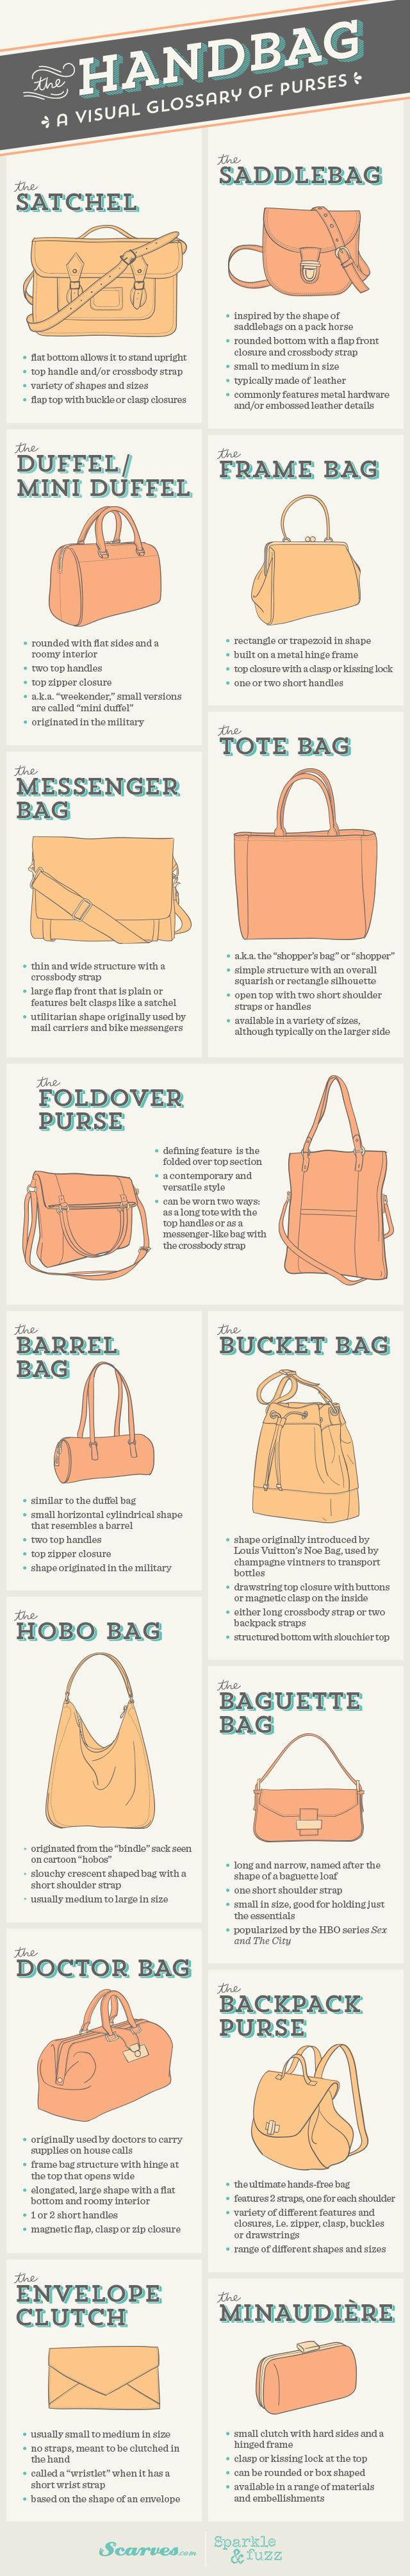 The Handbag A Visual Glossary of Purses infographic